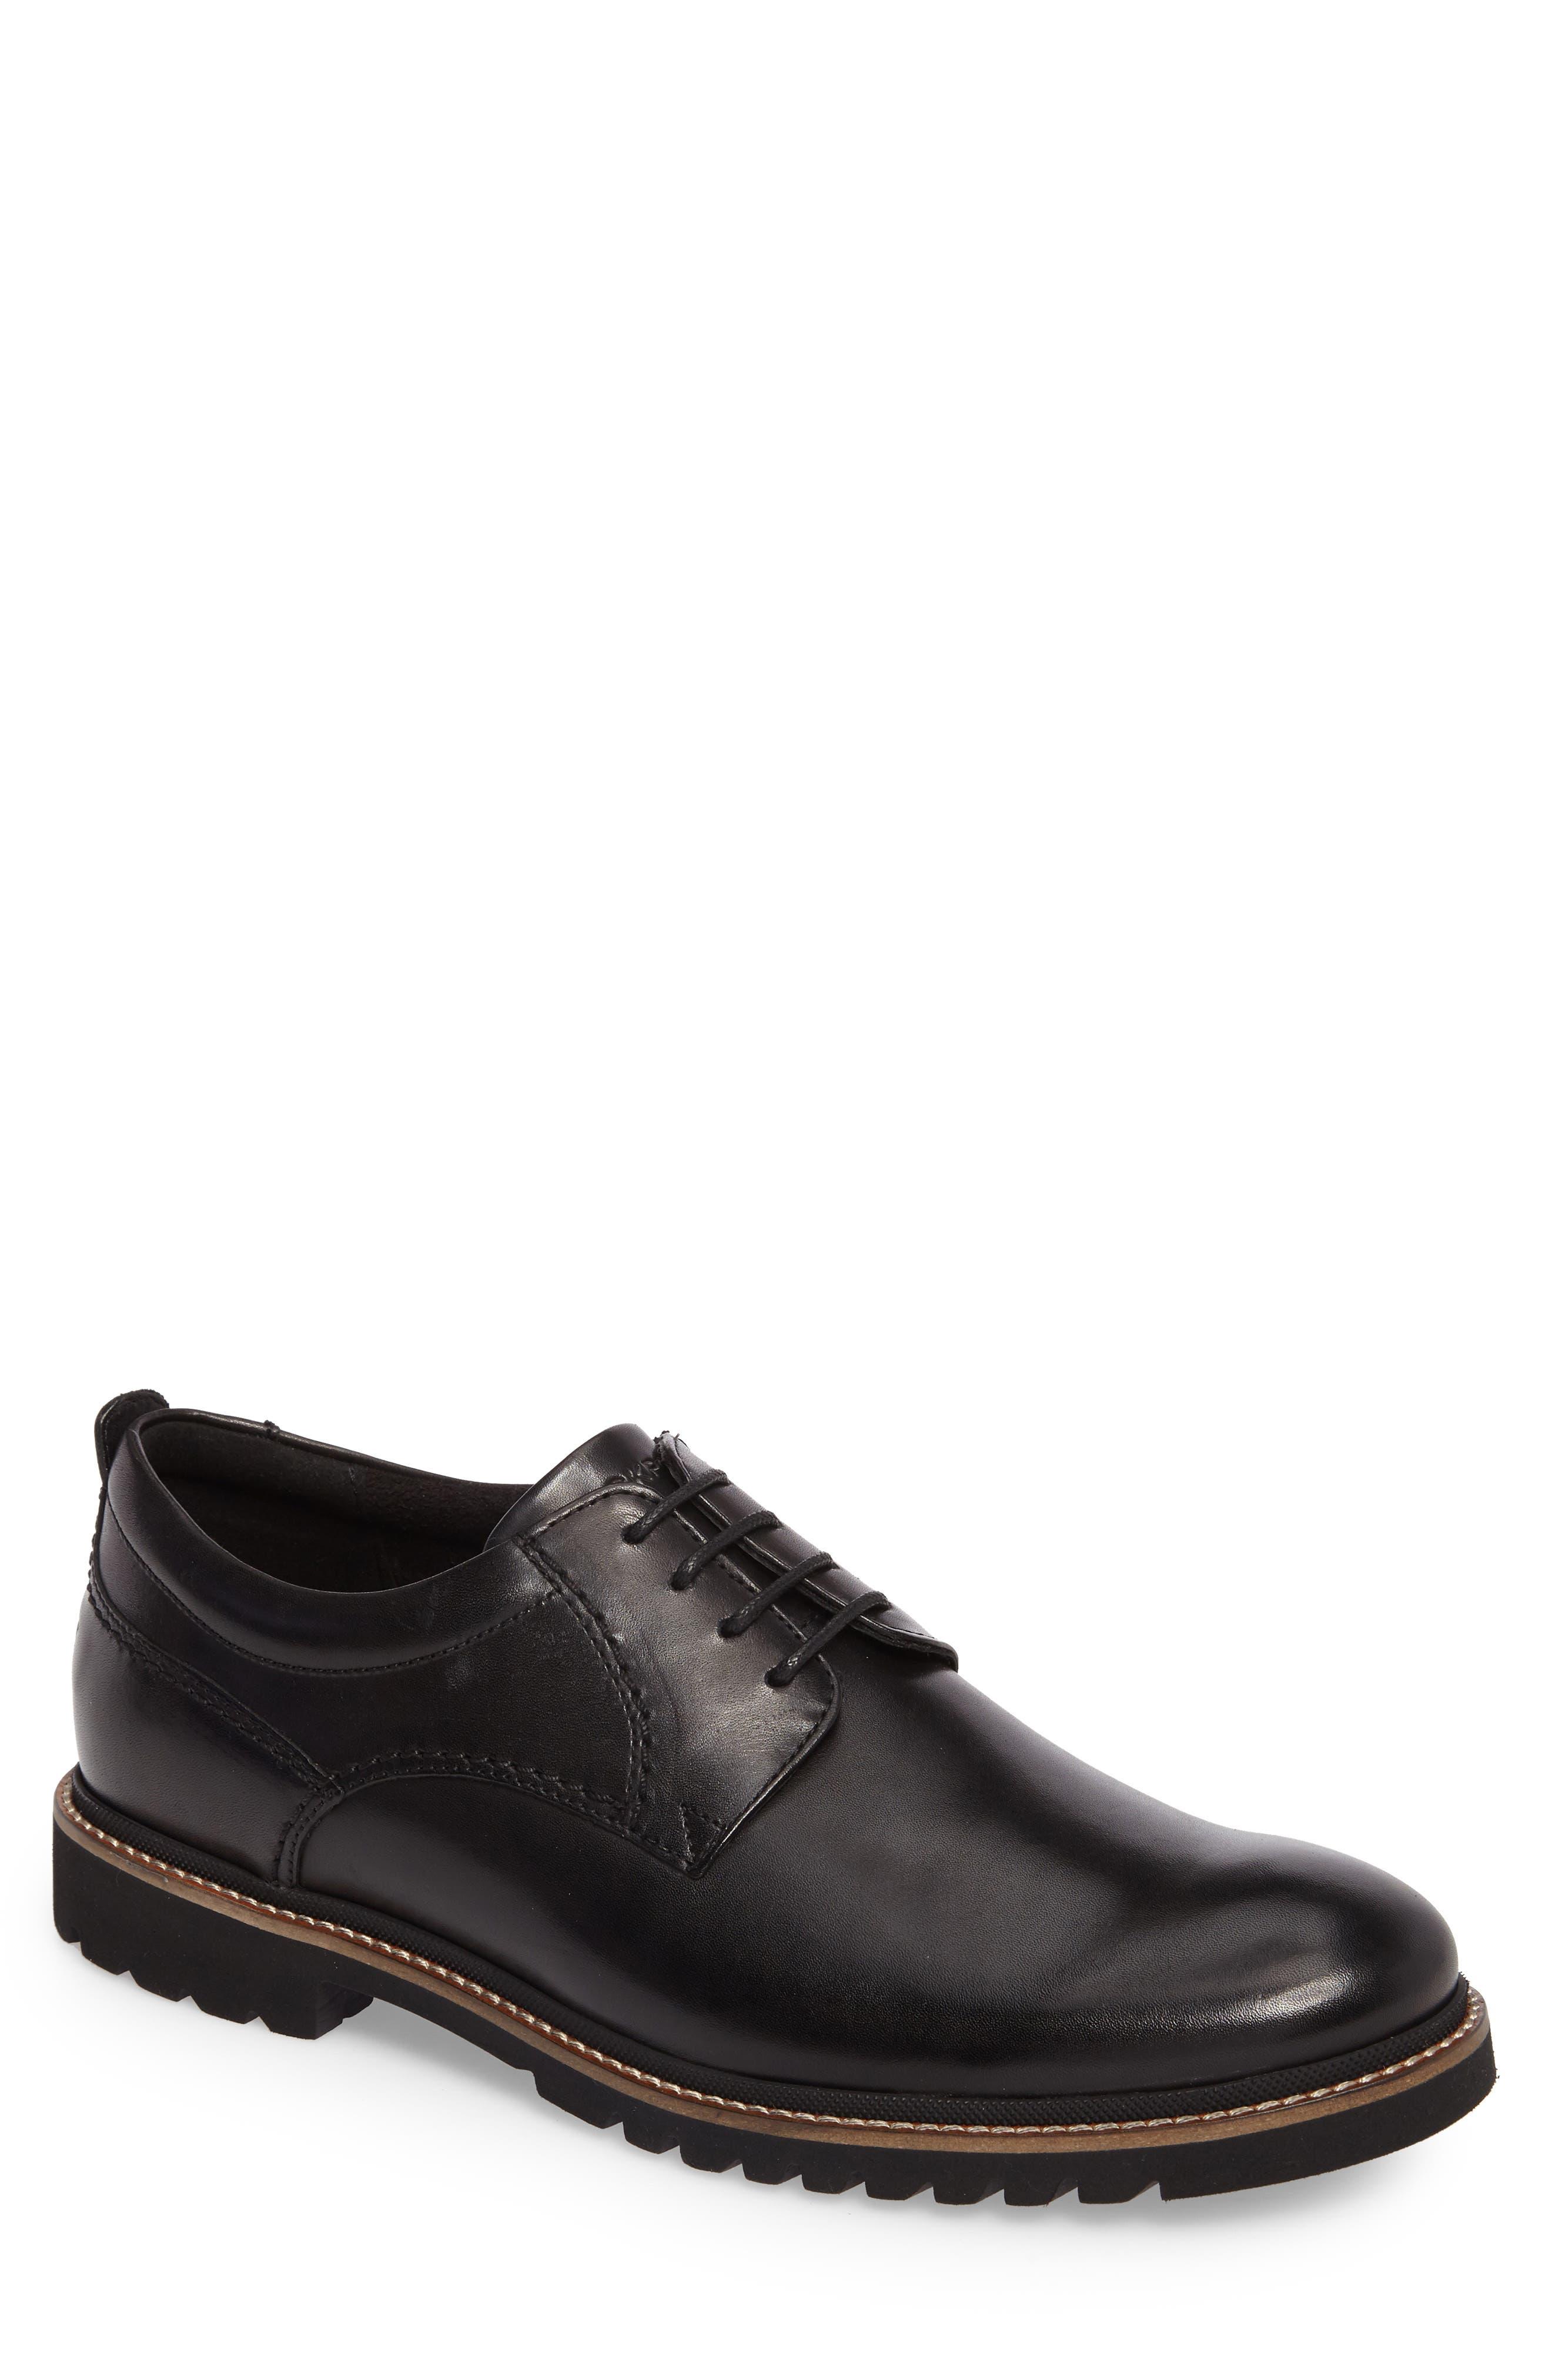 ROCKPORT Marshall Buck Shoe, Main, color, BLACK LEATHER